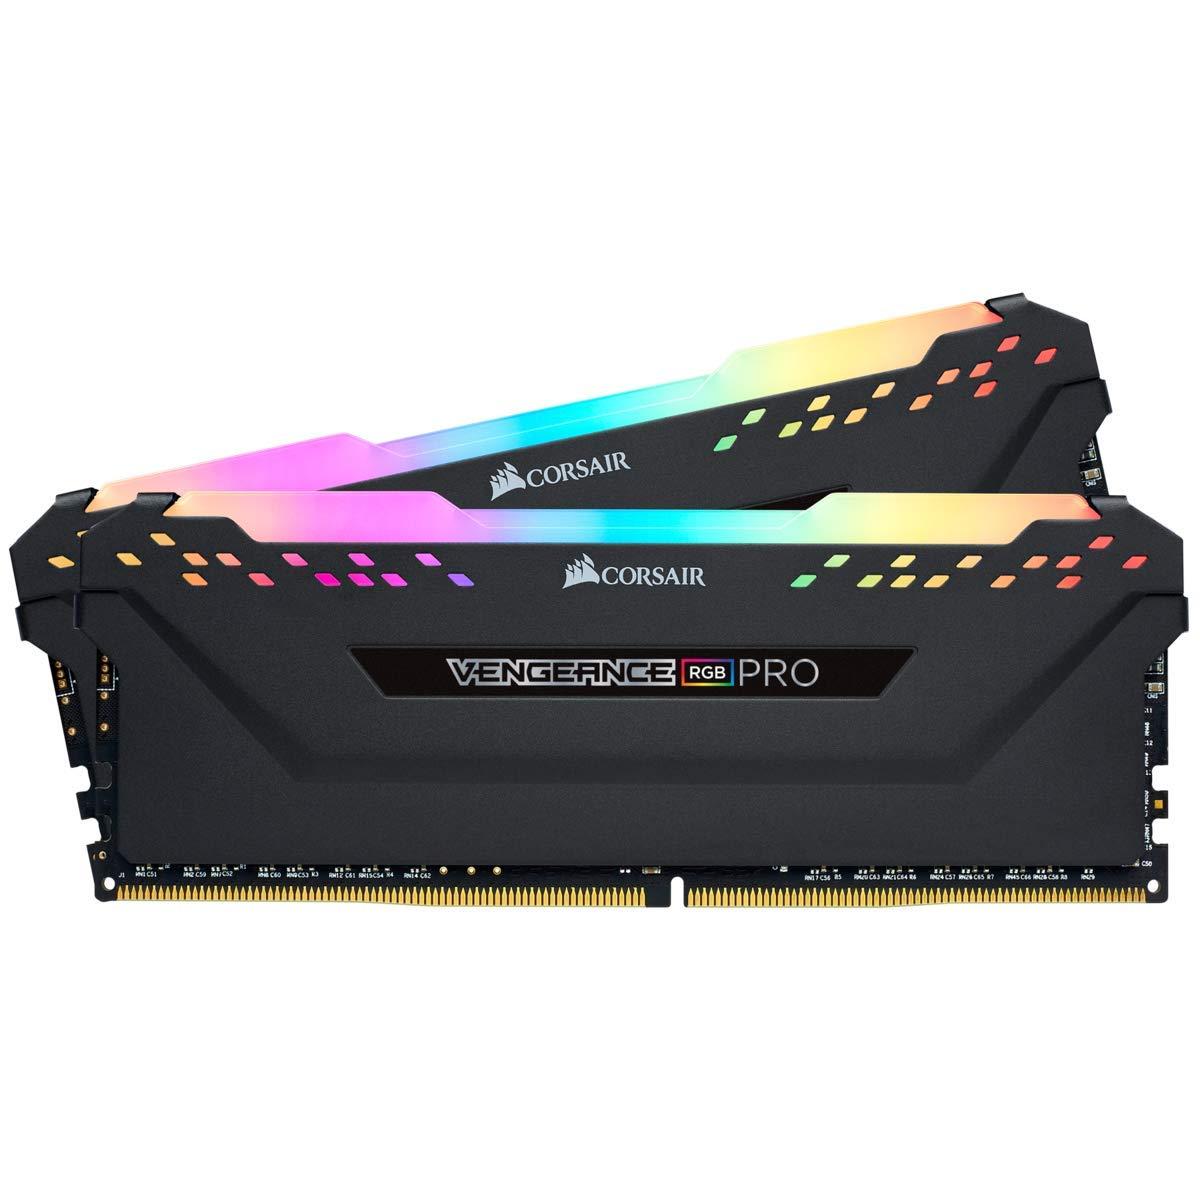 Memoria RAM 16GB Corsair Vengeance RGB Pro (2 x 8GB) 288-Pin DRAM DDR4 3000 (PC4 24000) CMW16GX4M2D3000C16